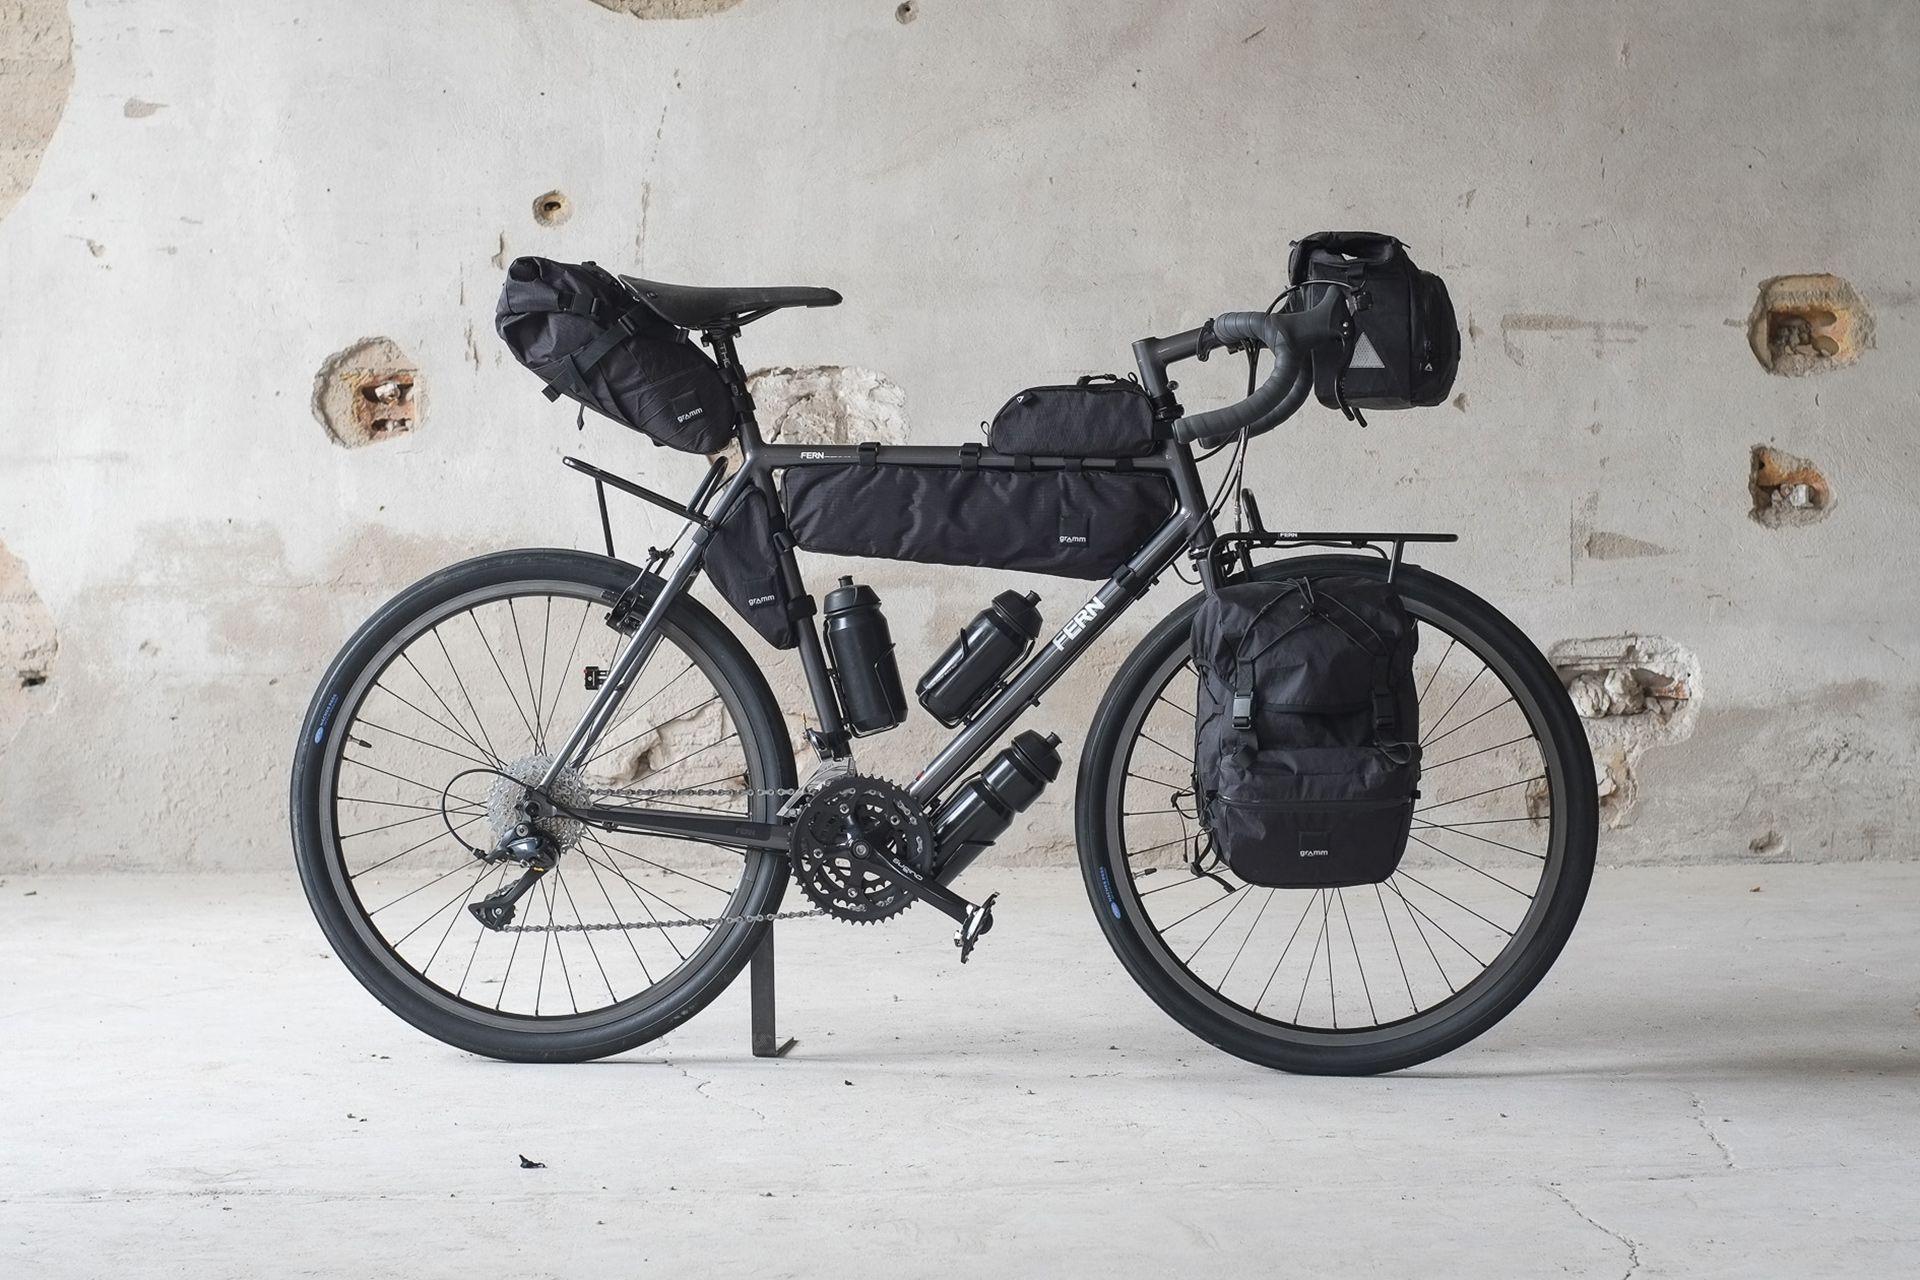 Fern Chacha Touring Bicycle Bike Trips Touring Bicycles